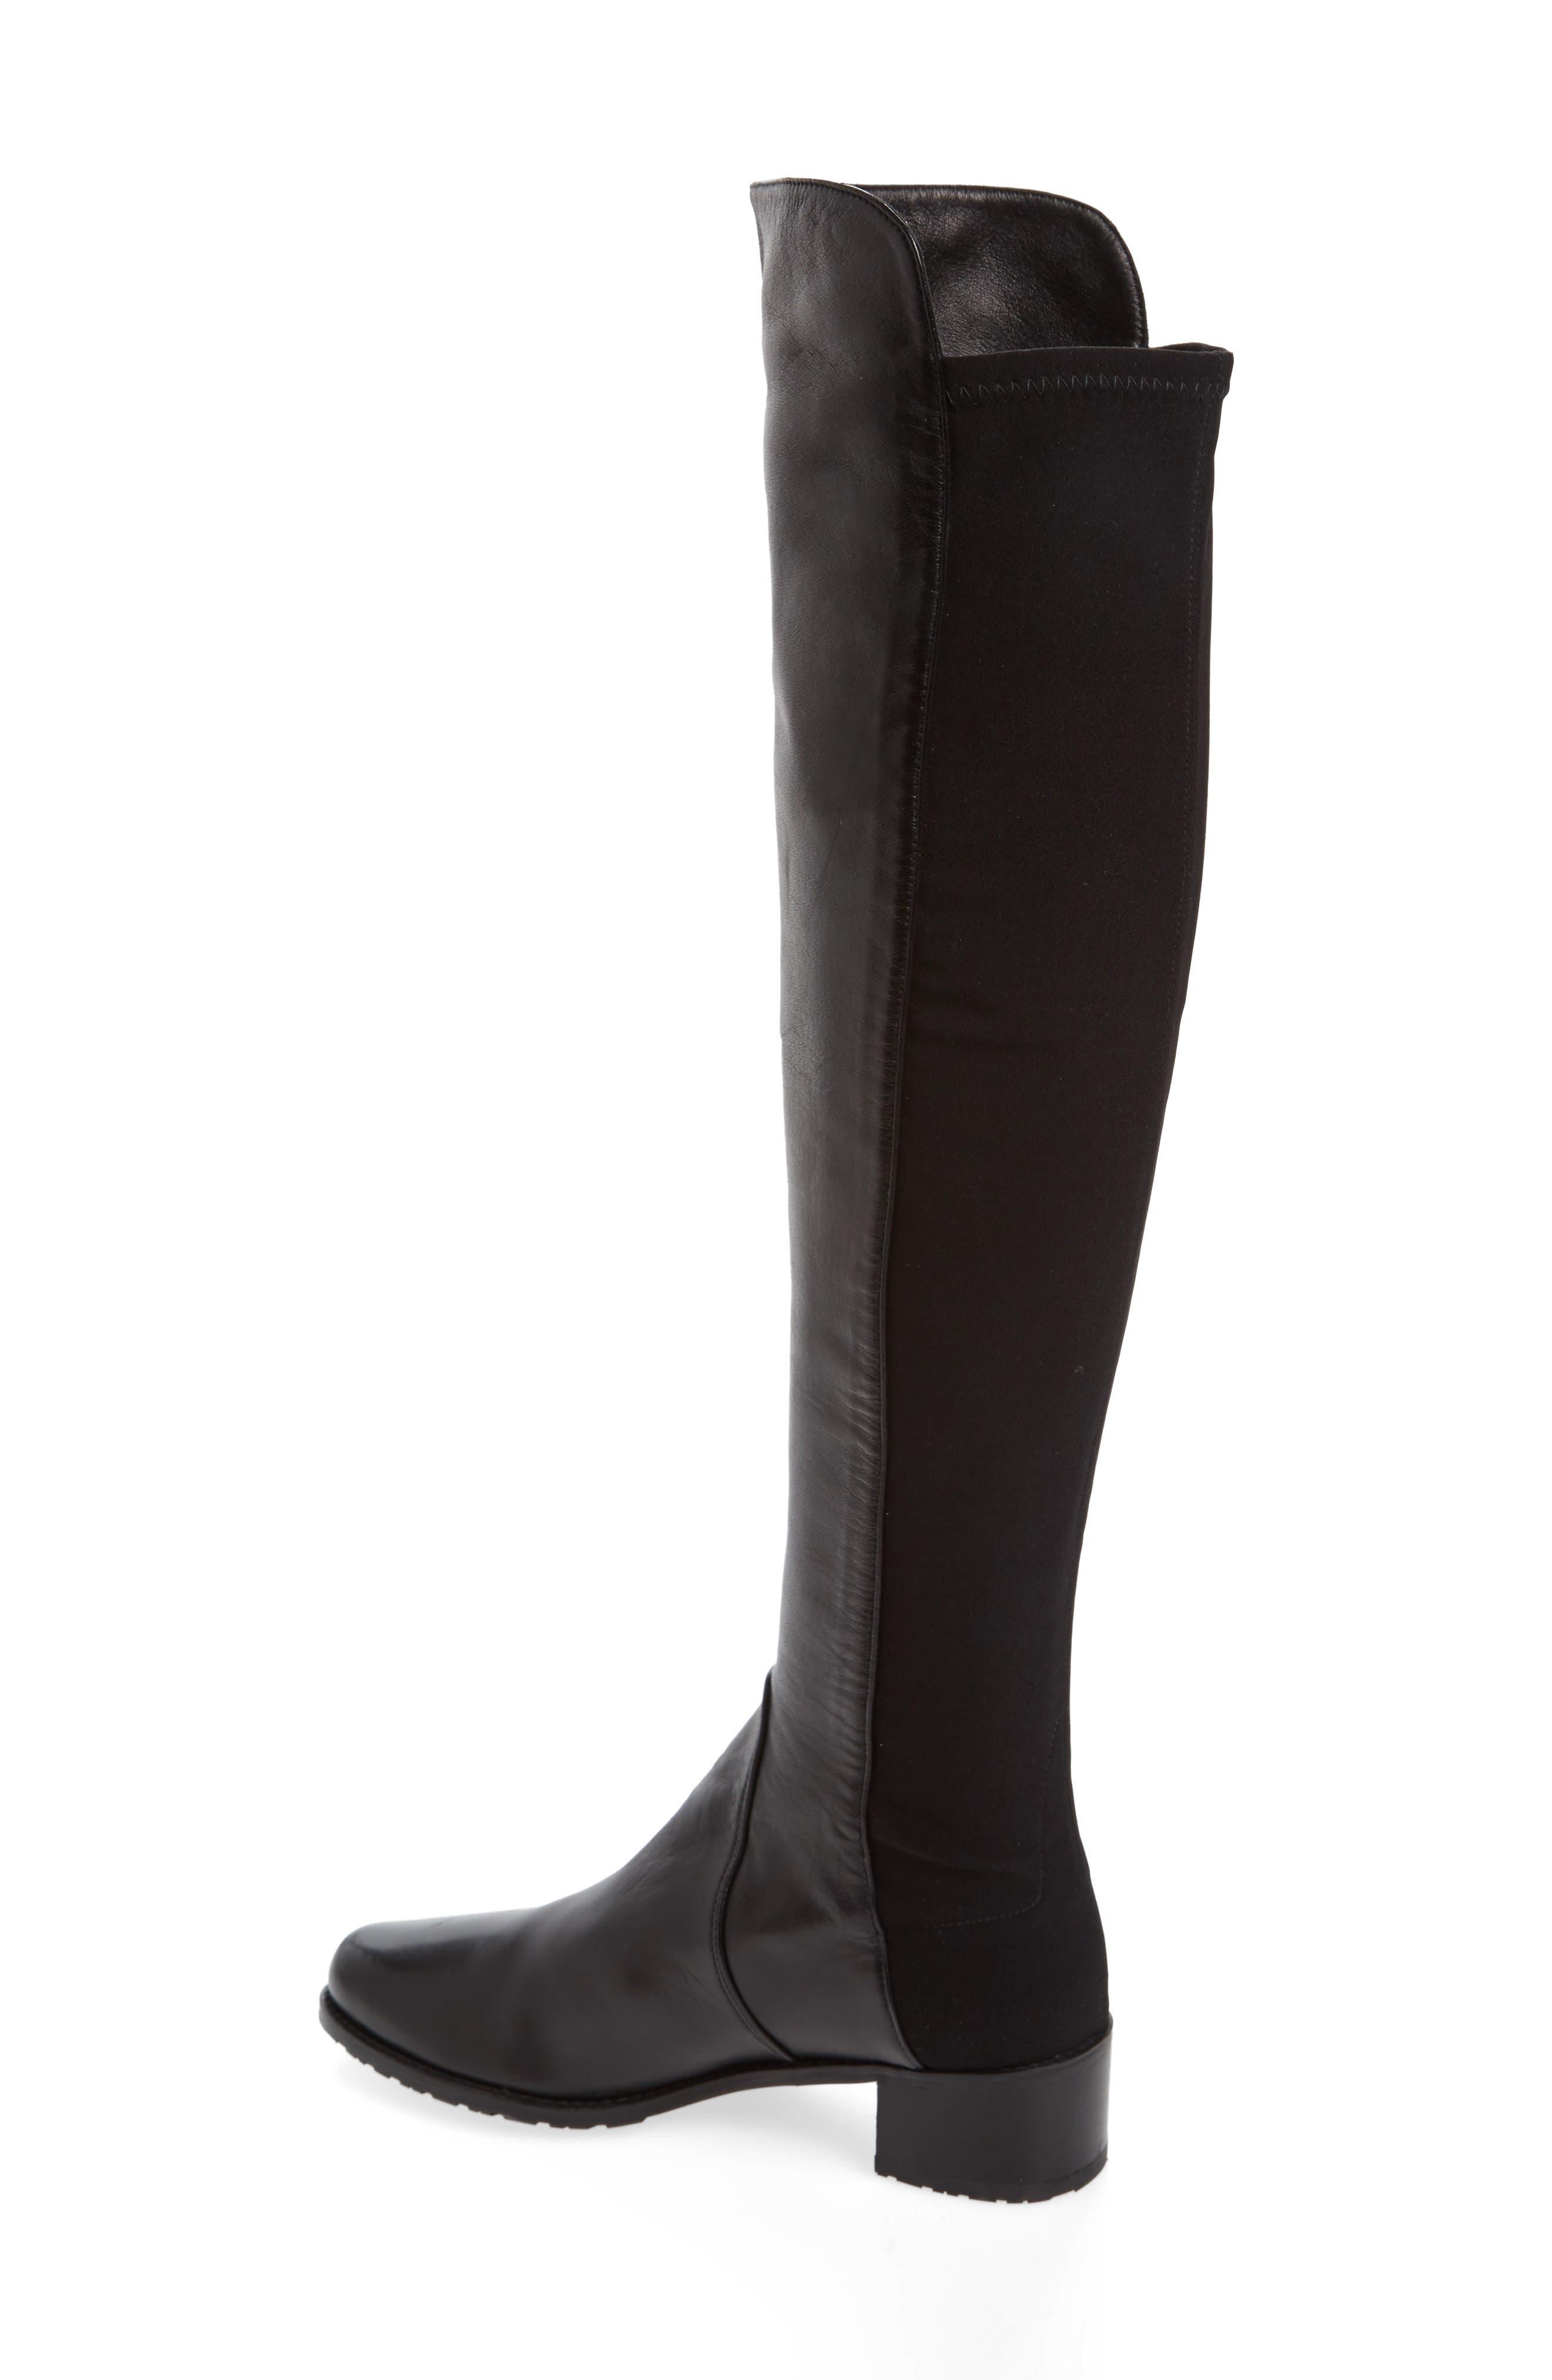 STUART WEITZMAN, 'Reserve' Over the Knee Boot, Alternate thumbnail 2, color, BLACK NAPPA